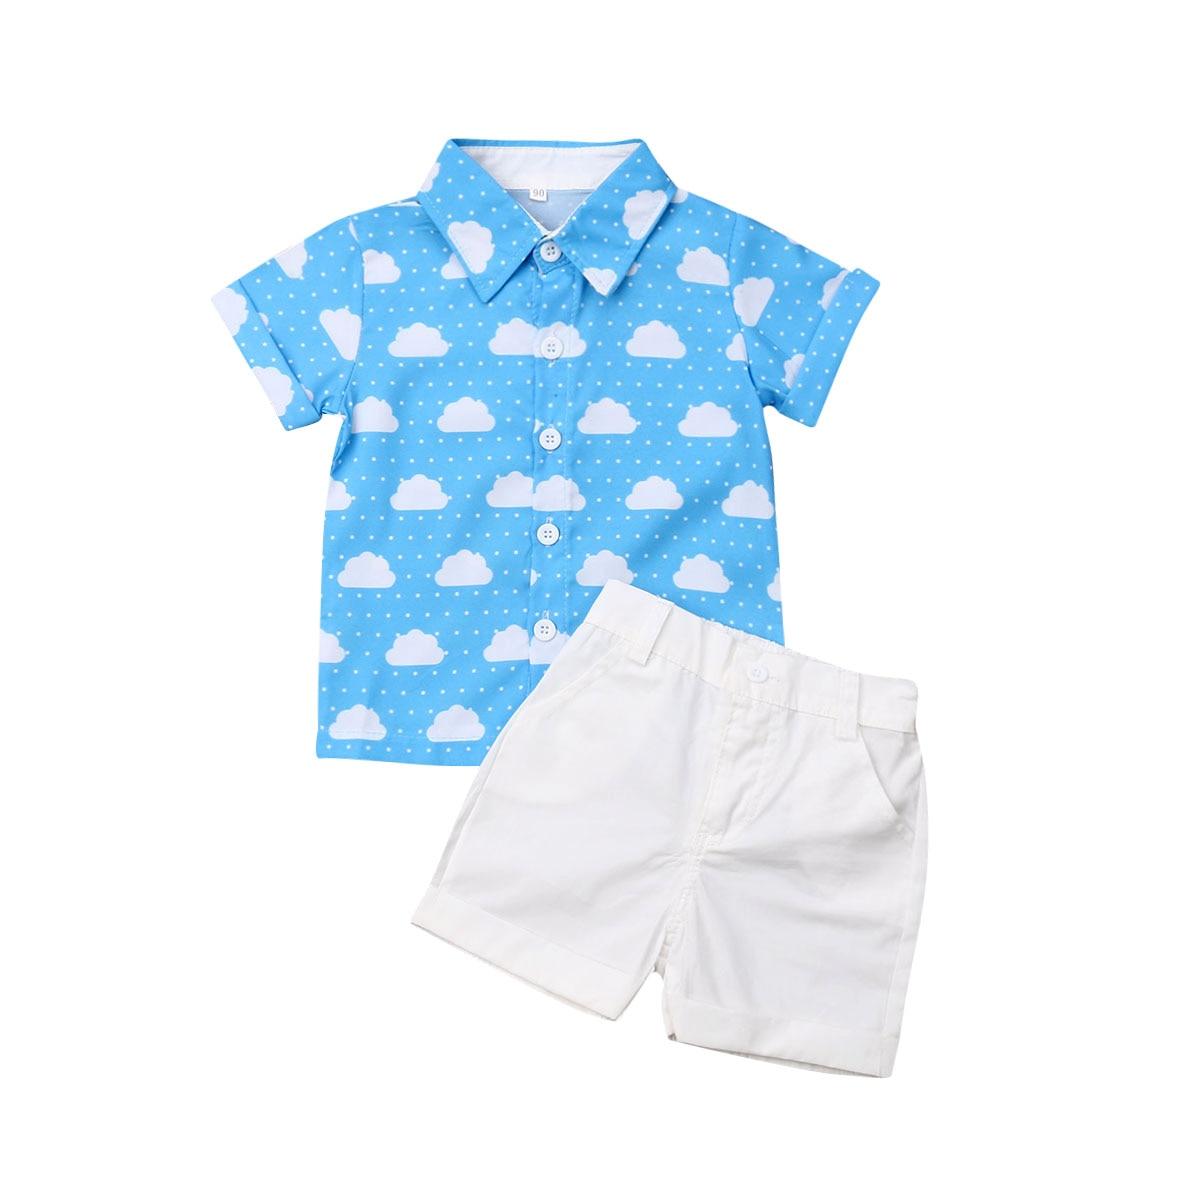 Citgeett Summer Newborn Baby Boy Girl Tops Romper Cloud Jumpsuit Pants shorts Outfits Clothes Gentle Set